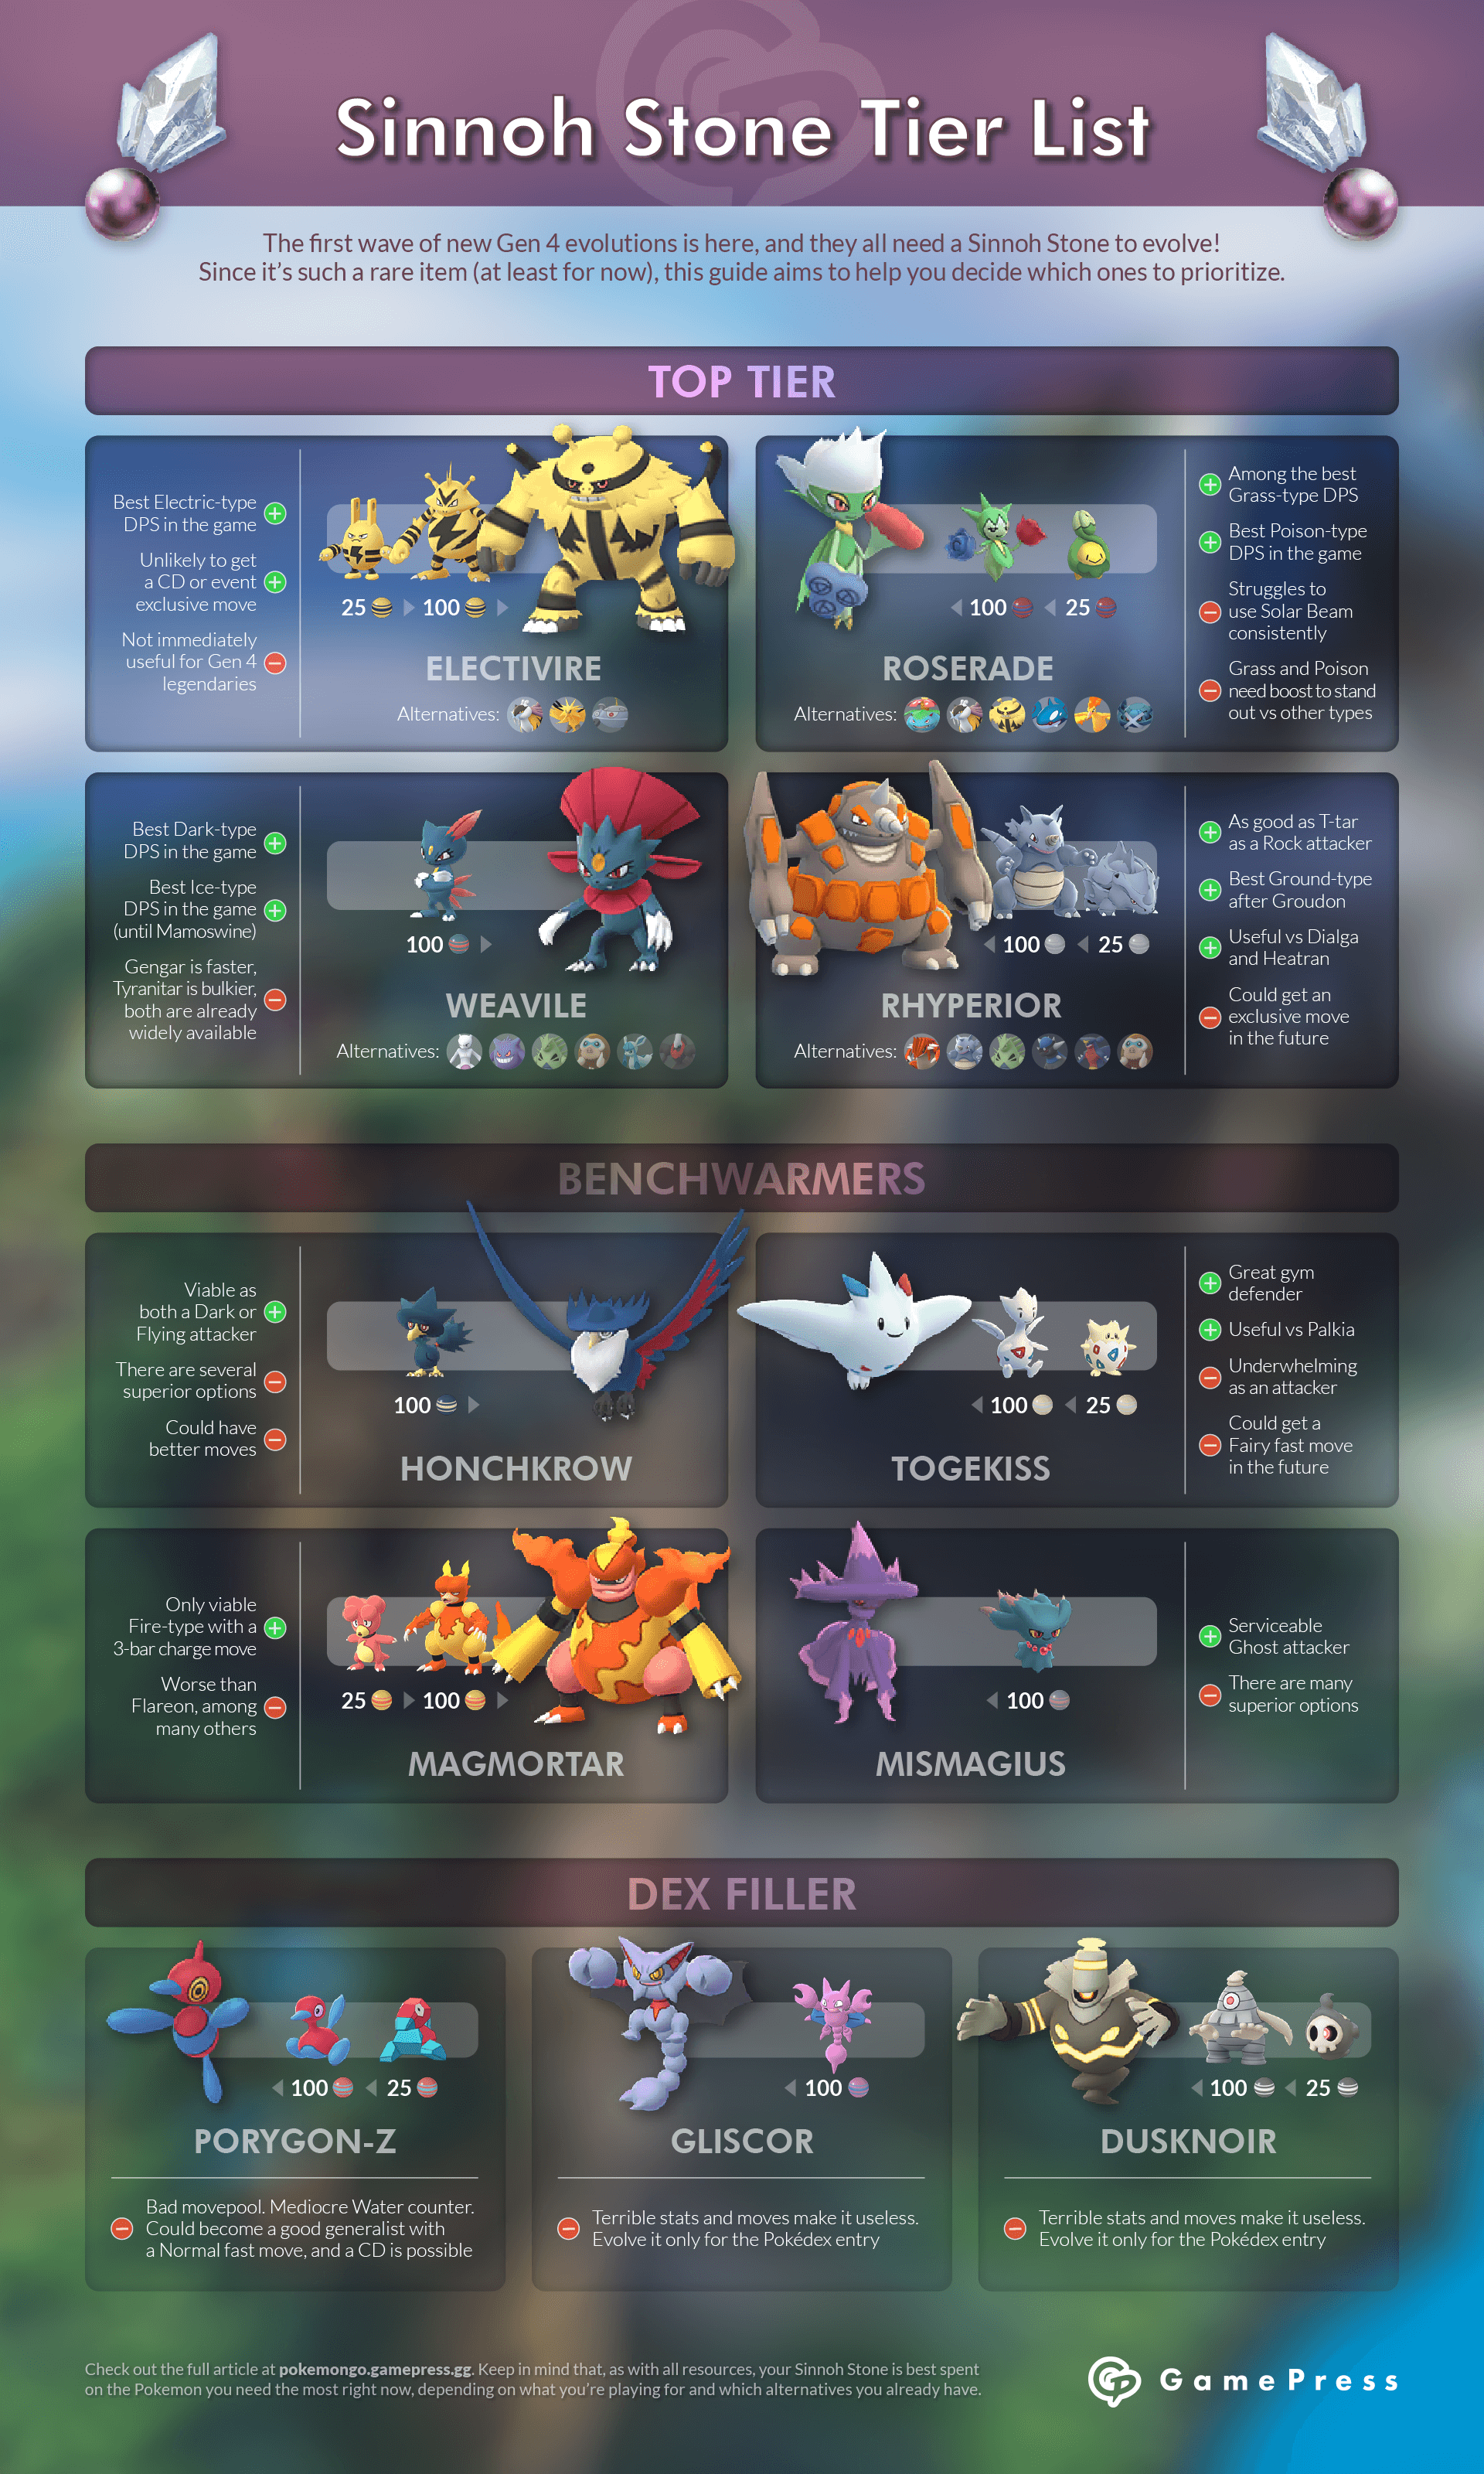 Sinnoh Stone Tier List | Pokemon GO GamePress | Pokémon GO